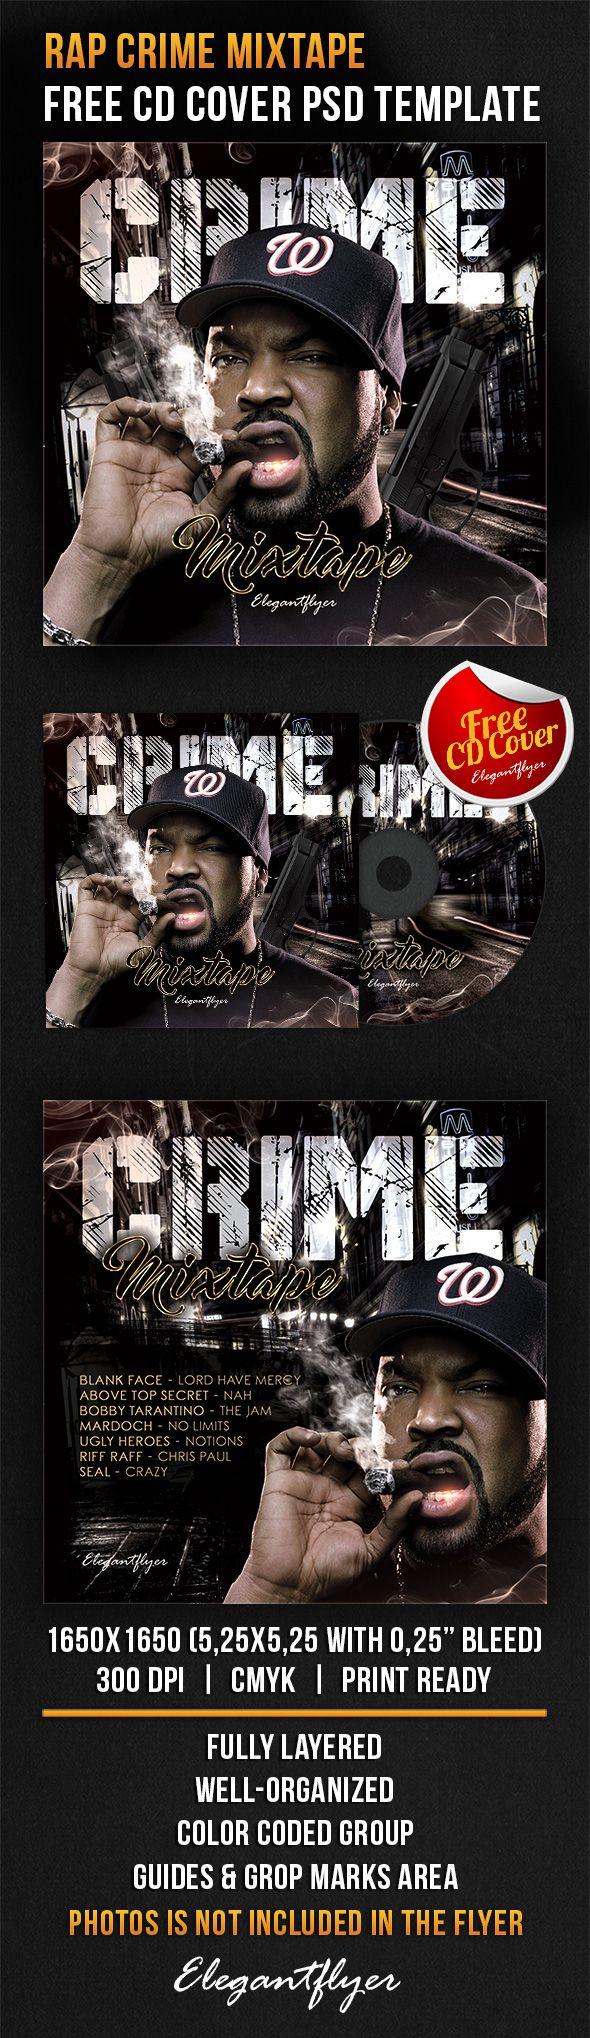 Rap Crime Mixtape – Free CD Cover PSD Template https://www.elegantflyer.com/free-cd-dvd-templates/rap-crime-mixtape-free-cd-cover-psd-template/